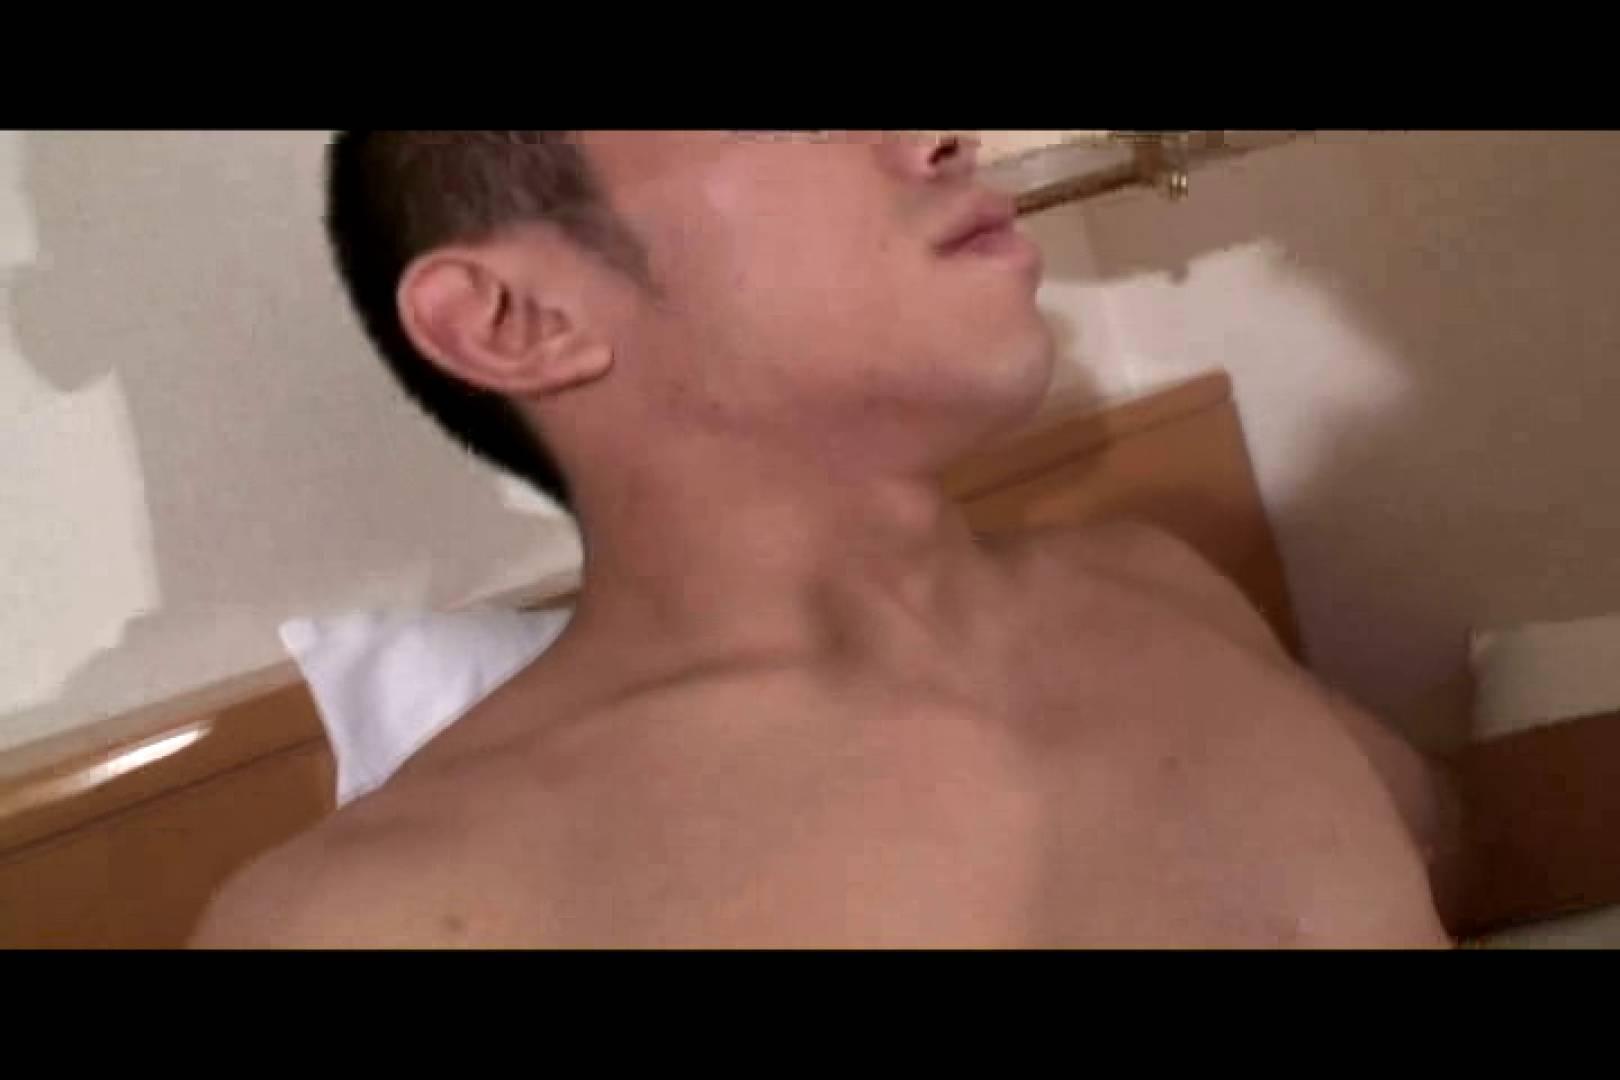 Bistro「イケメン」~Mokkori和風仕立て~vol.04 オナニー アダルトビデオ画像キャプチャ 91枚 73